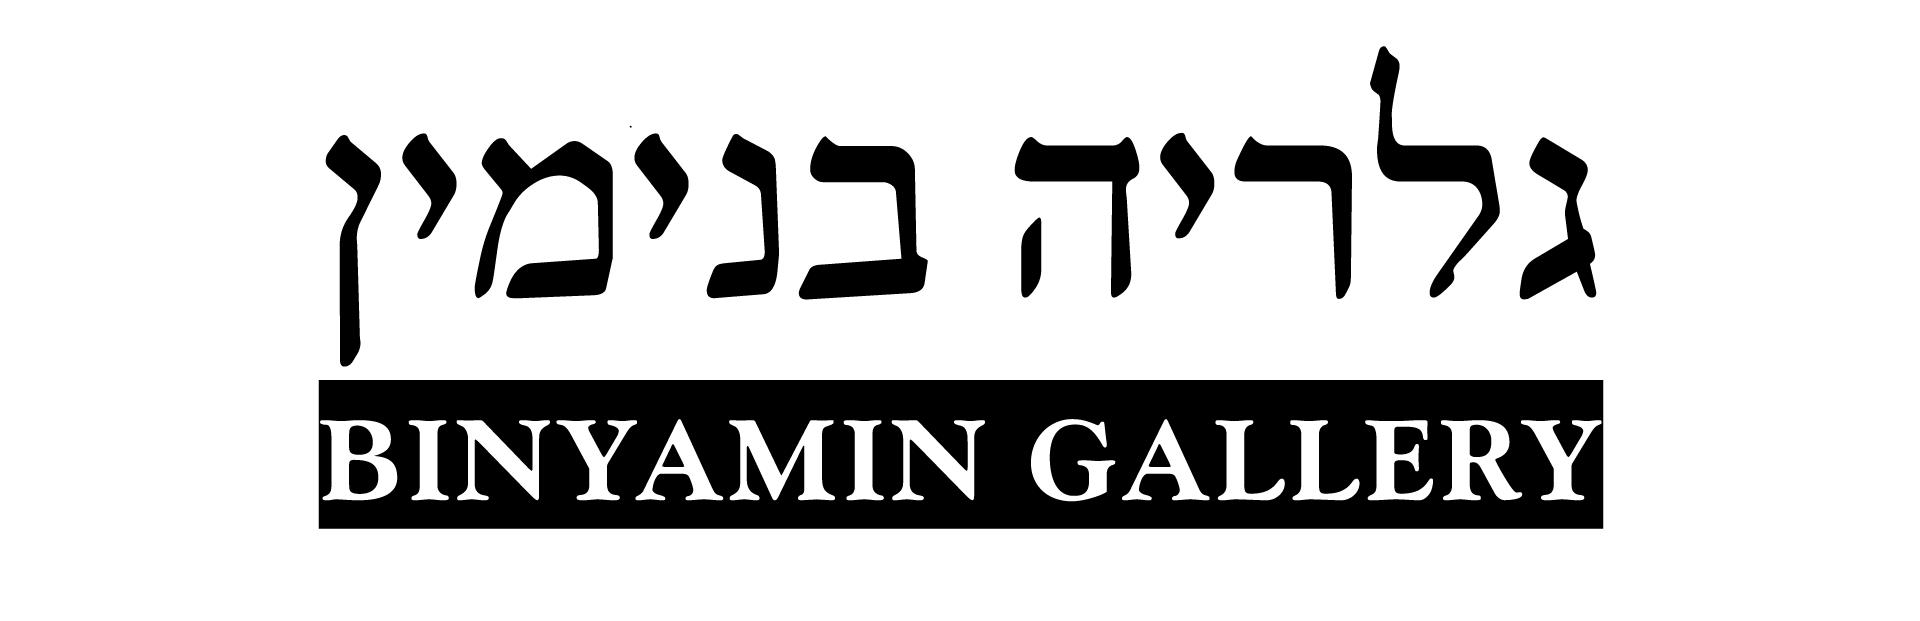 Binyamin Gallery - Logo - English & Hebrew | גלריה בנימין - לוגו- עברית ואנגלית